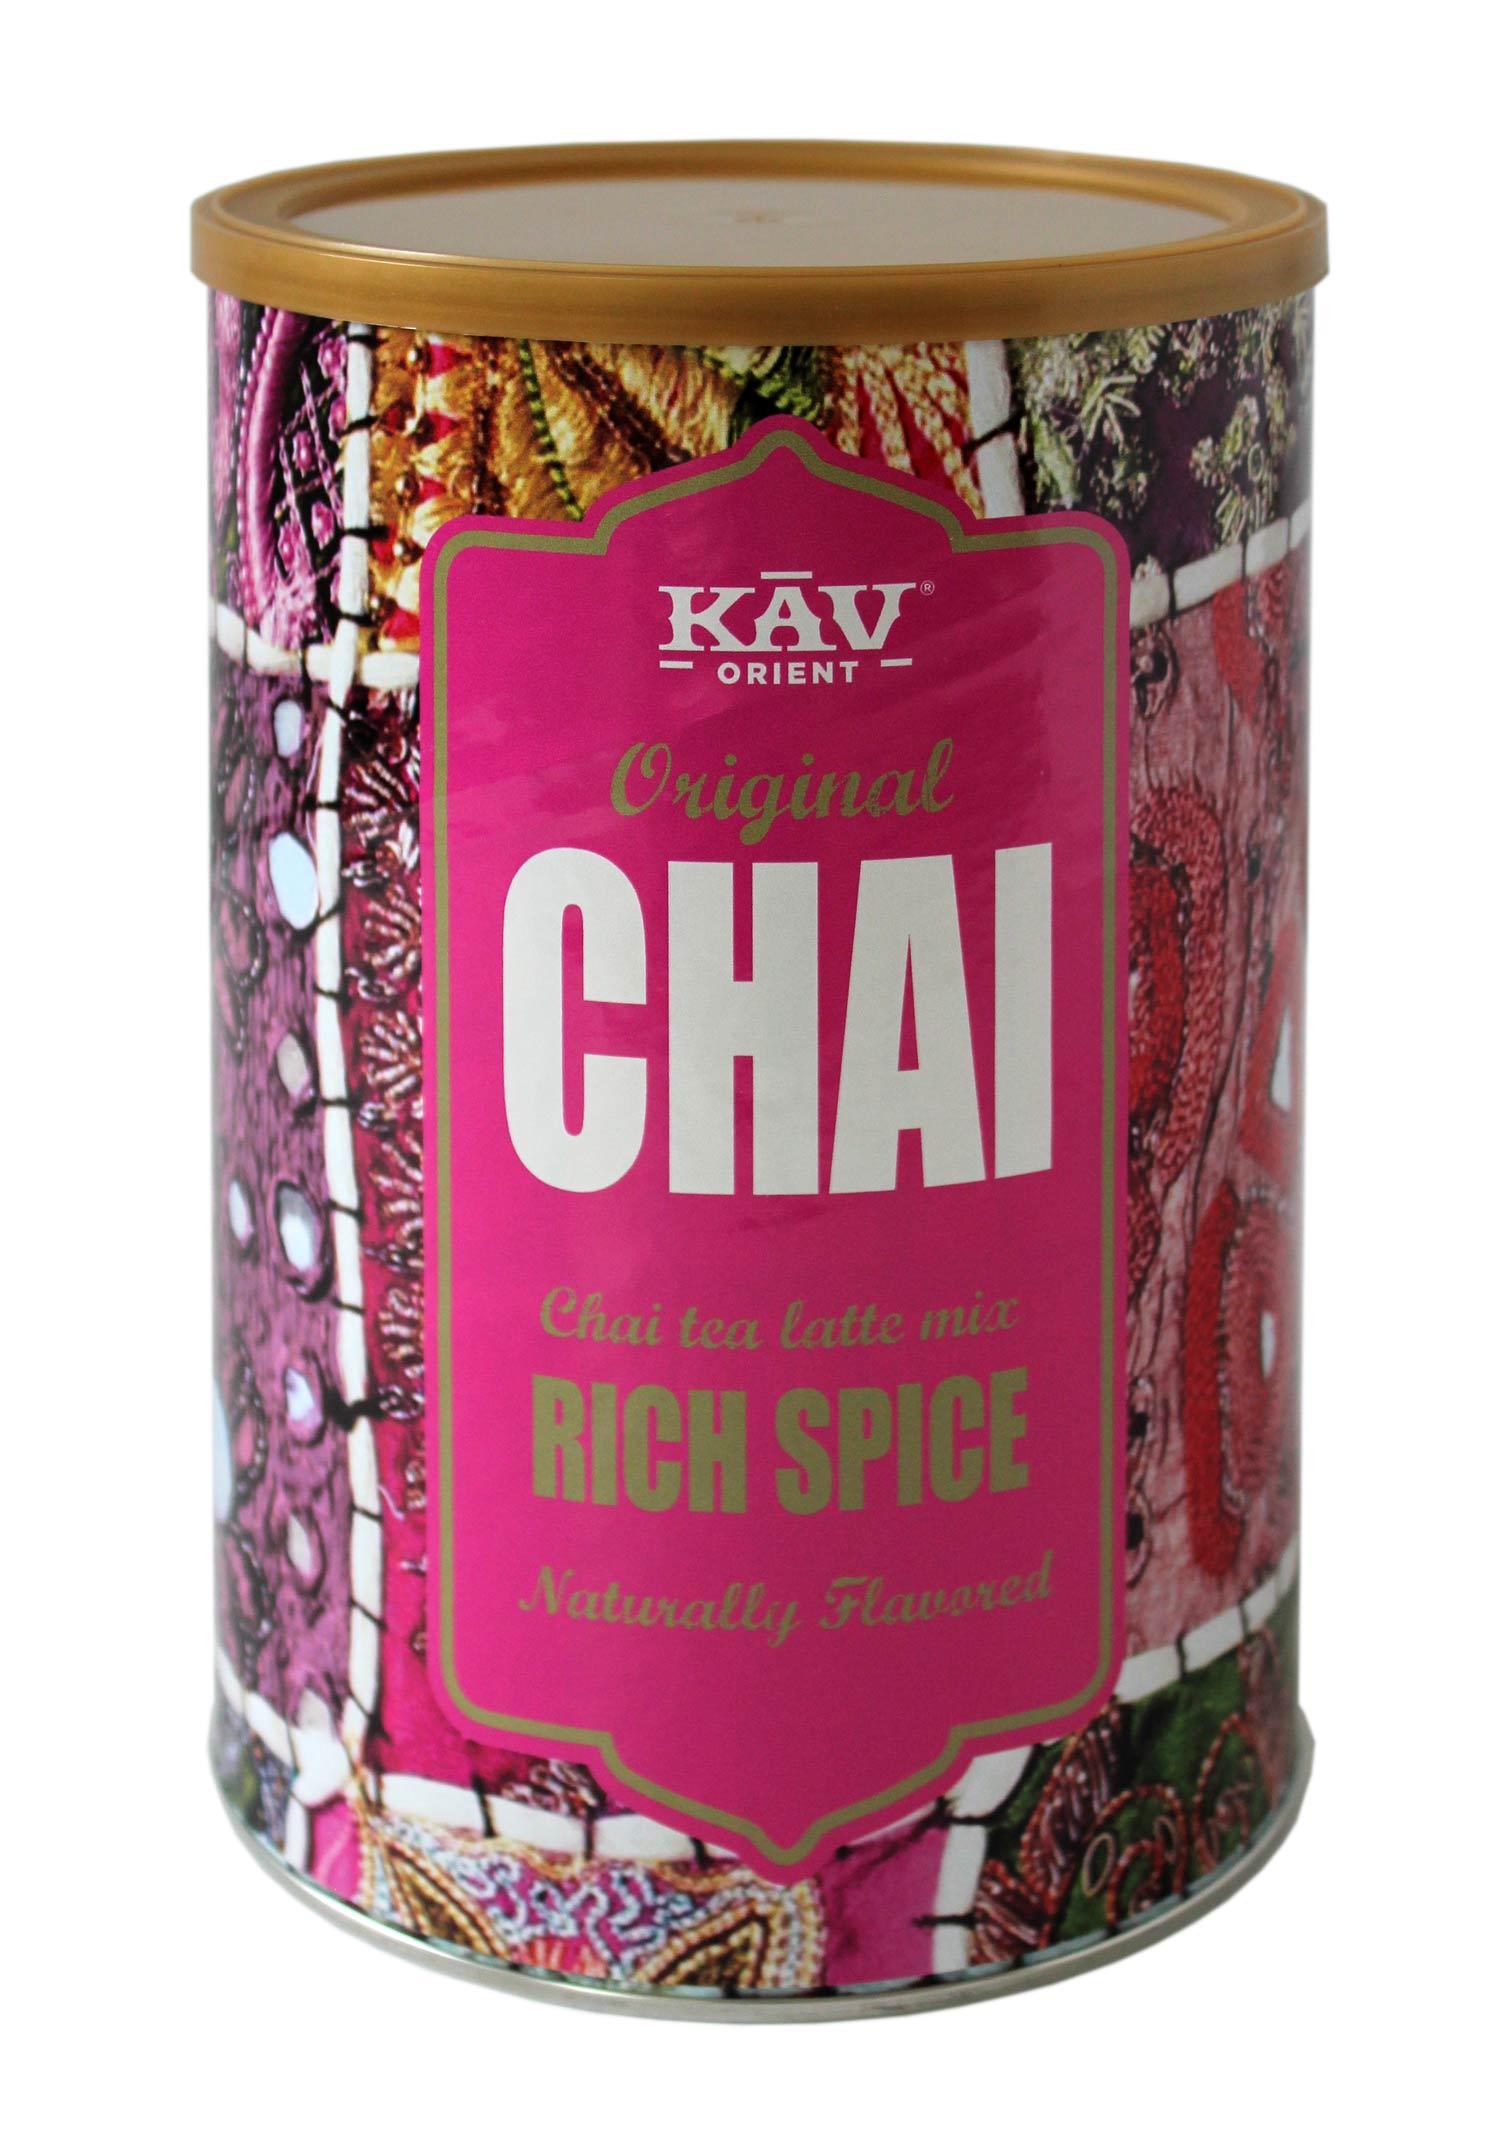 KAV_reefill_Rich_spice_chai